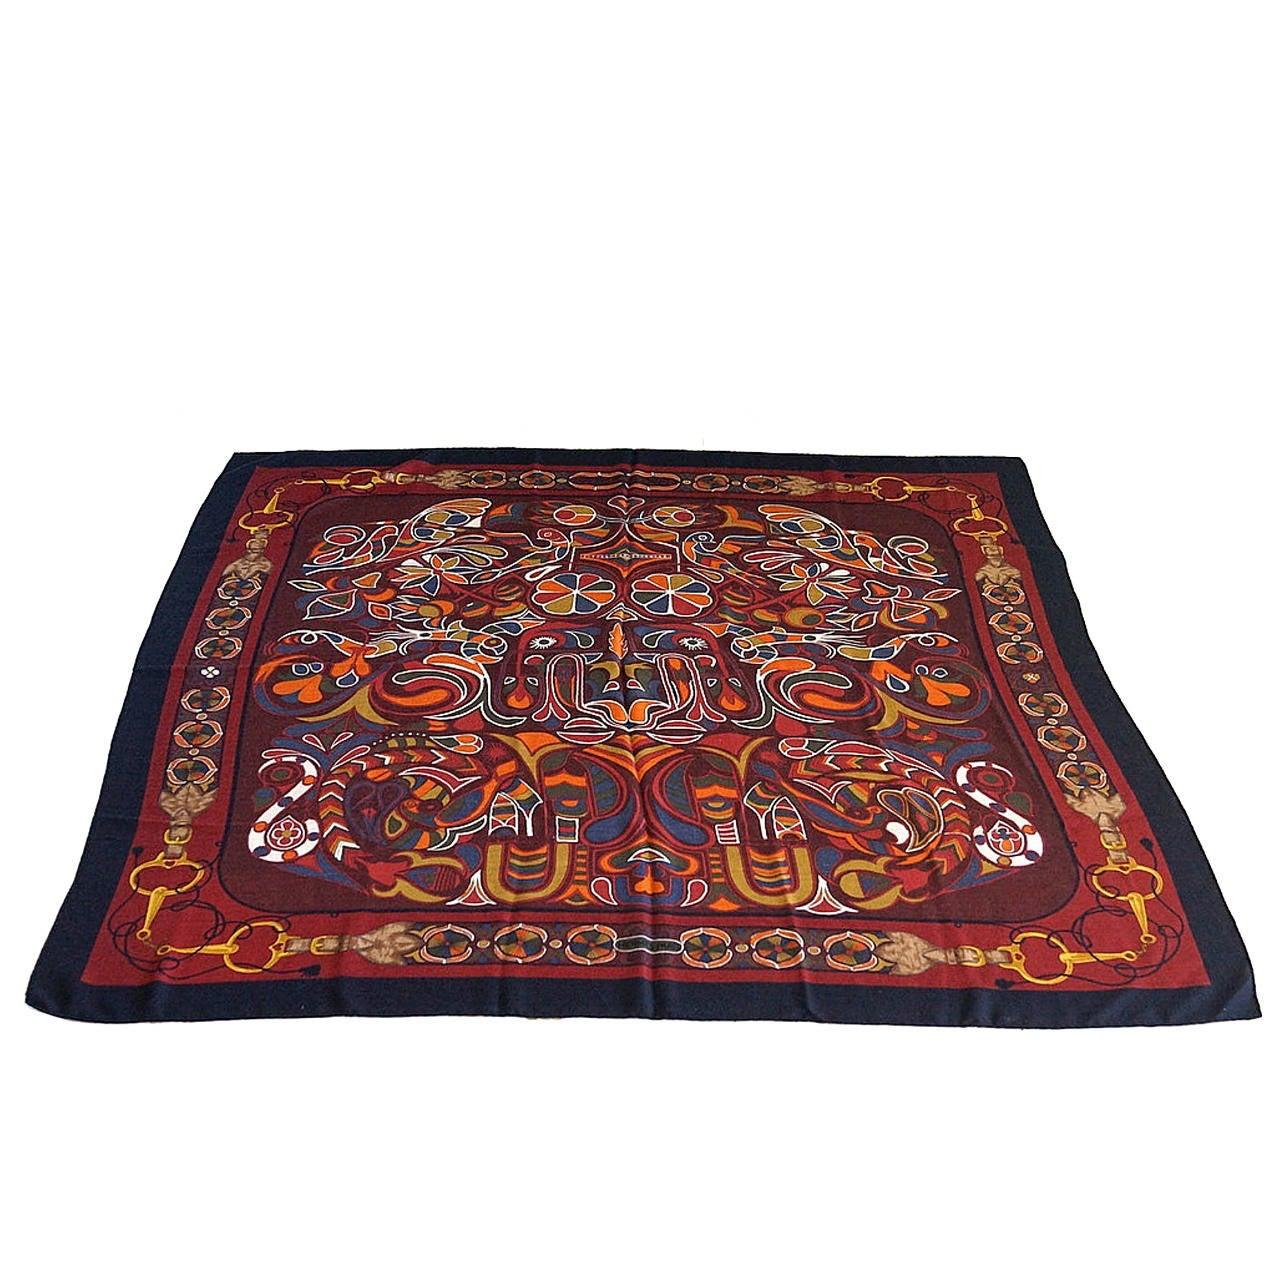 Hermes Scarf Shawl Folklore Motif Rich Color and Design Cashmere Silk Vintage